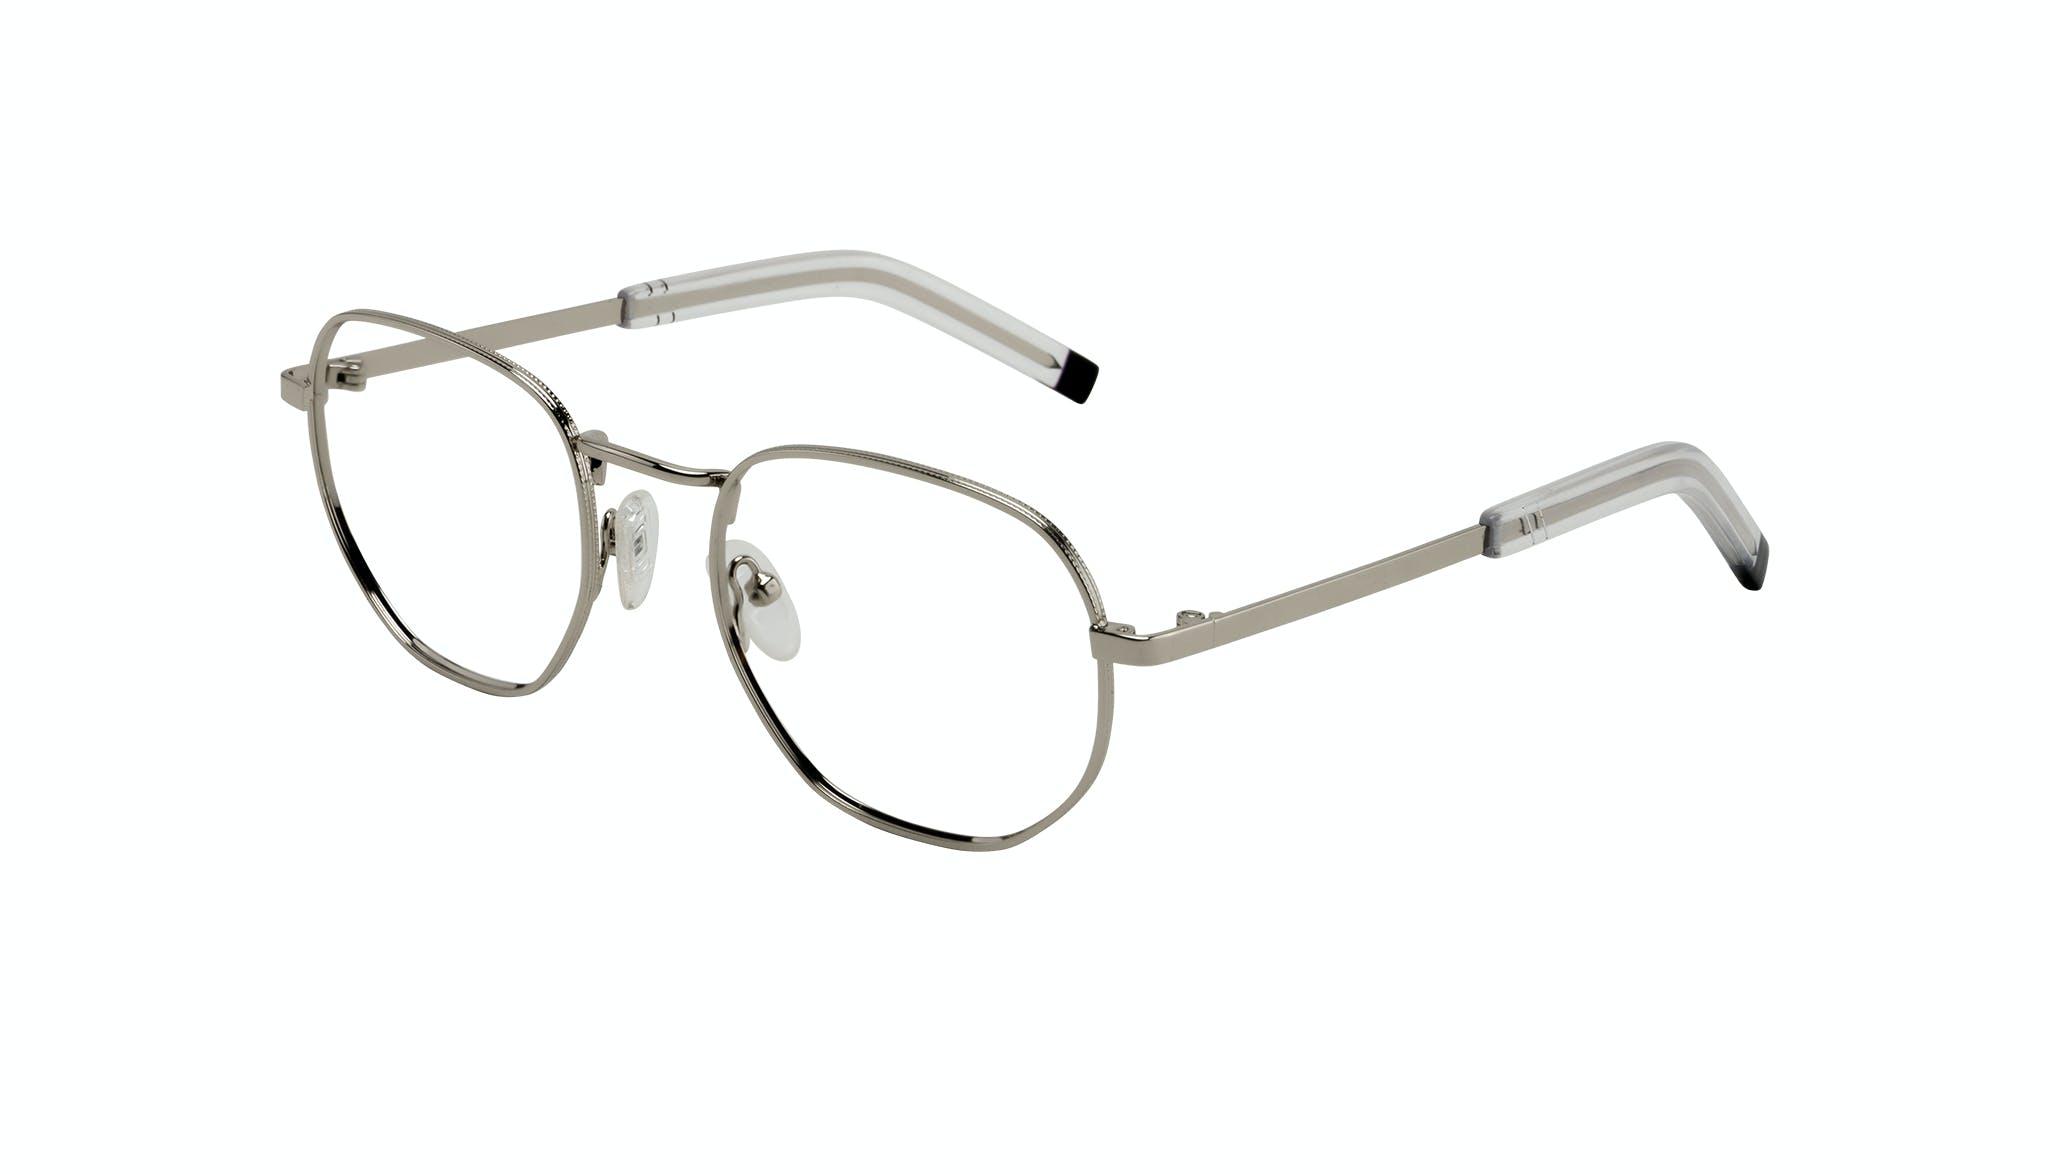 Affordable Fashion Glasses Round Eyeglasses Men Rise Silver Tilt